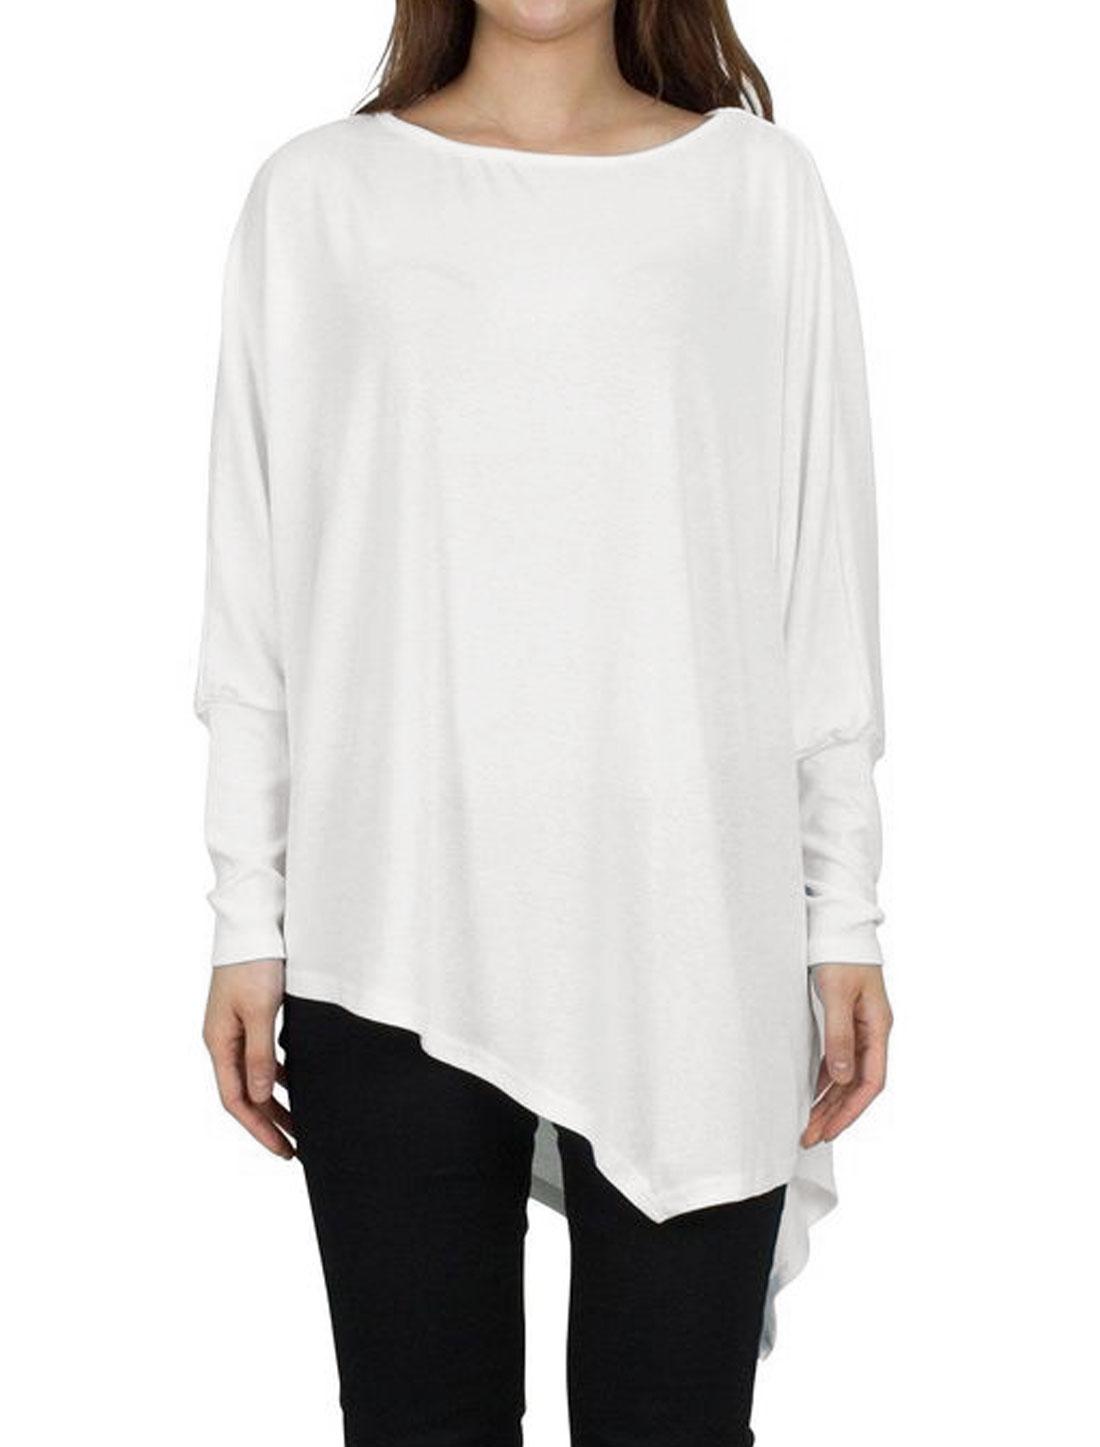 Women Round Neck Long Batwing Sleeves Loose Fit Asymmetric Hem Tunic Top White M